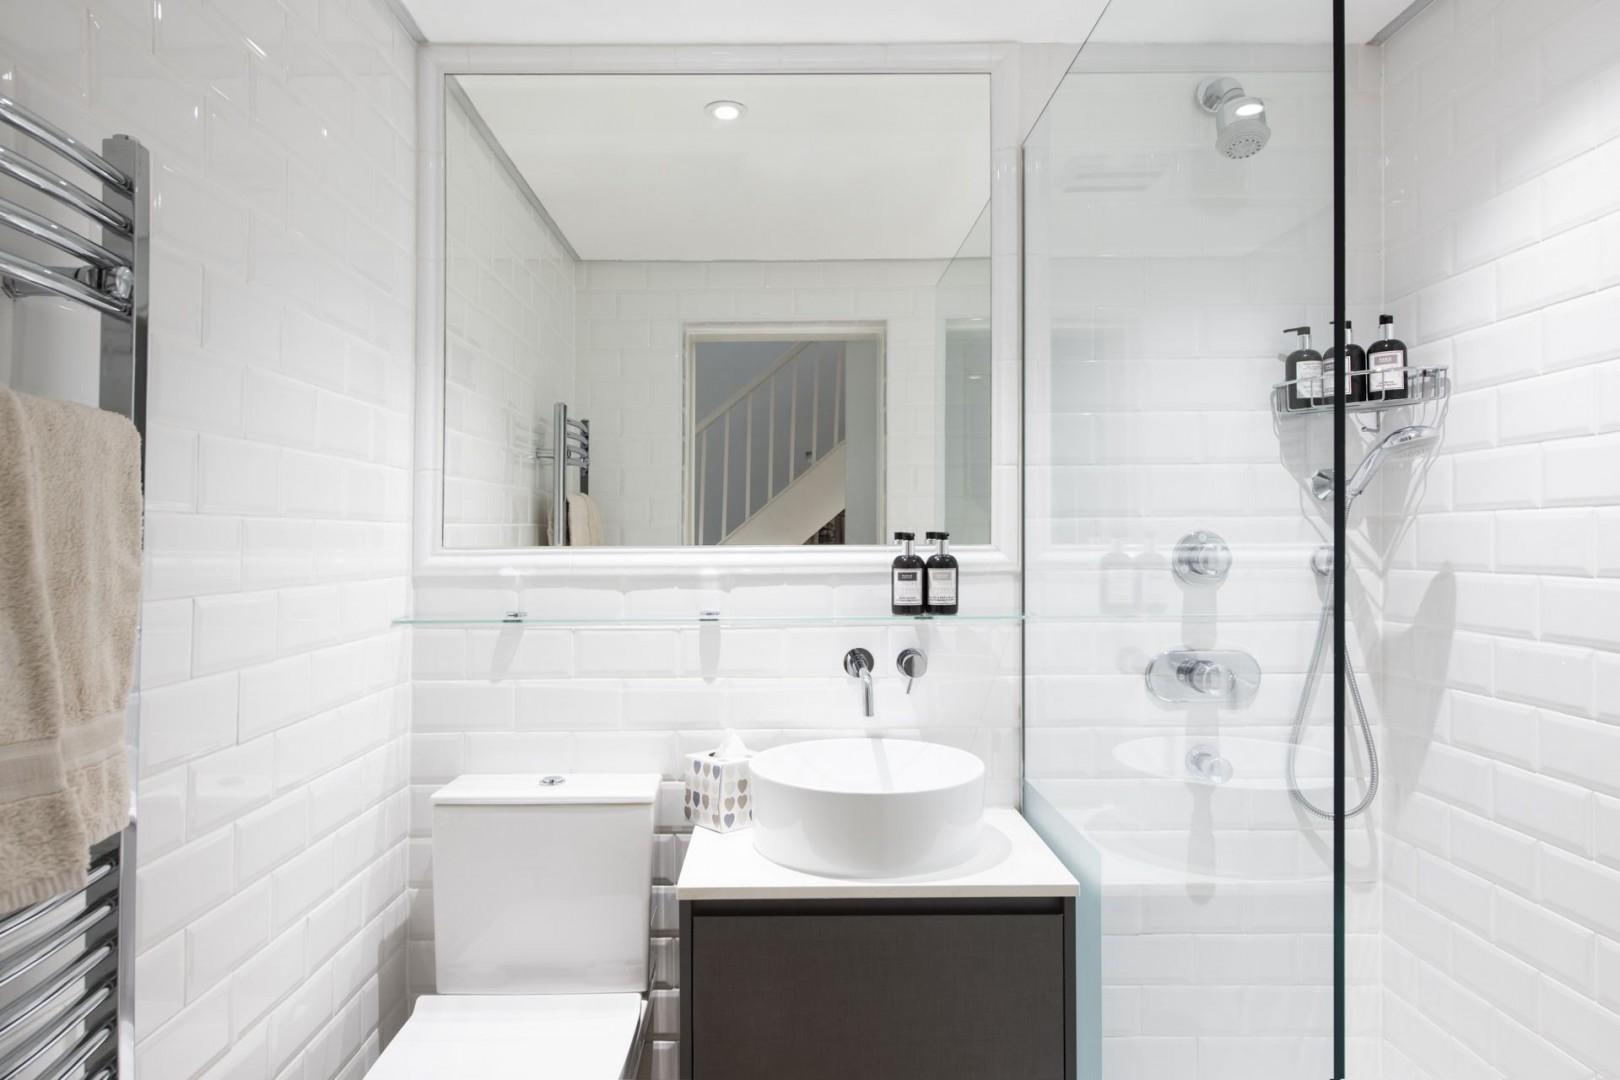 Look at this beautiful bathroom